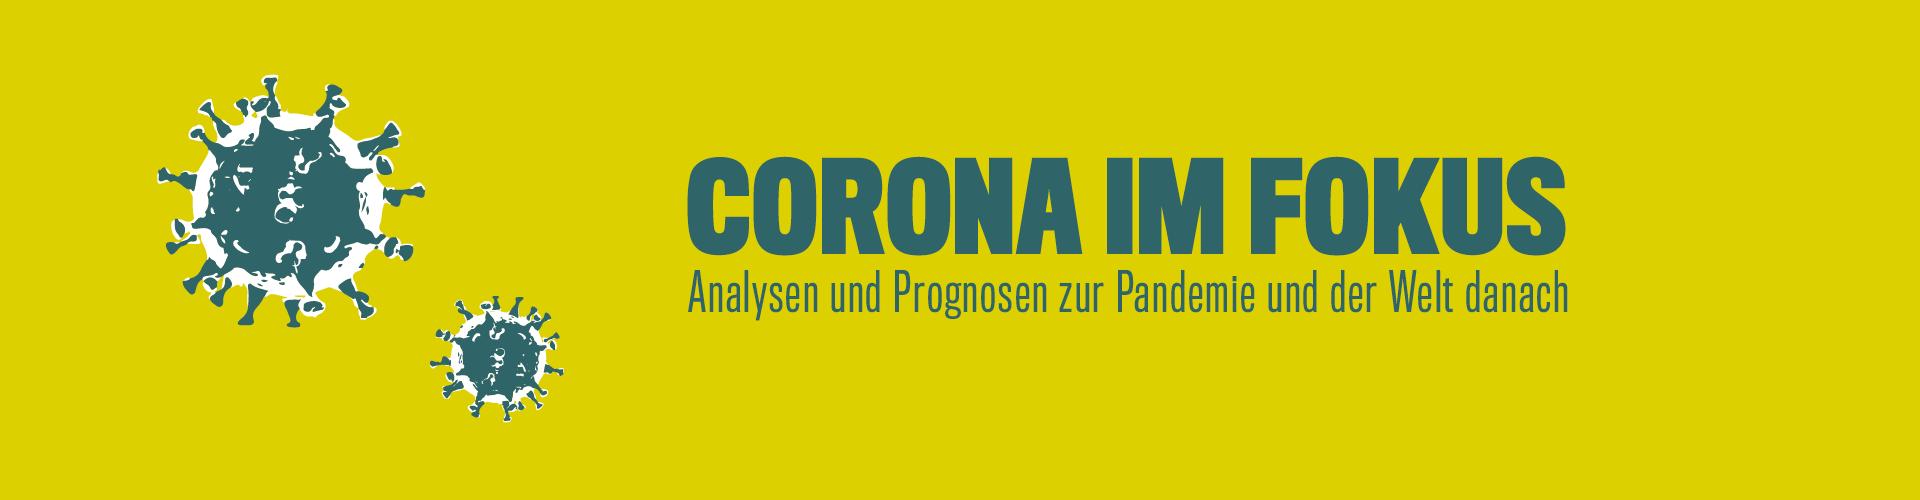 Corona im Fokus